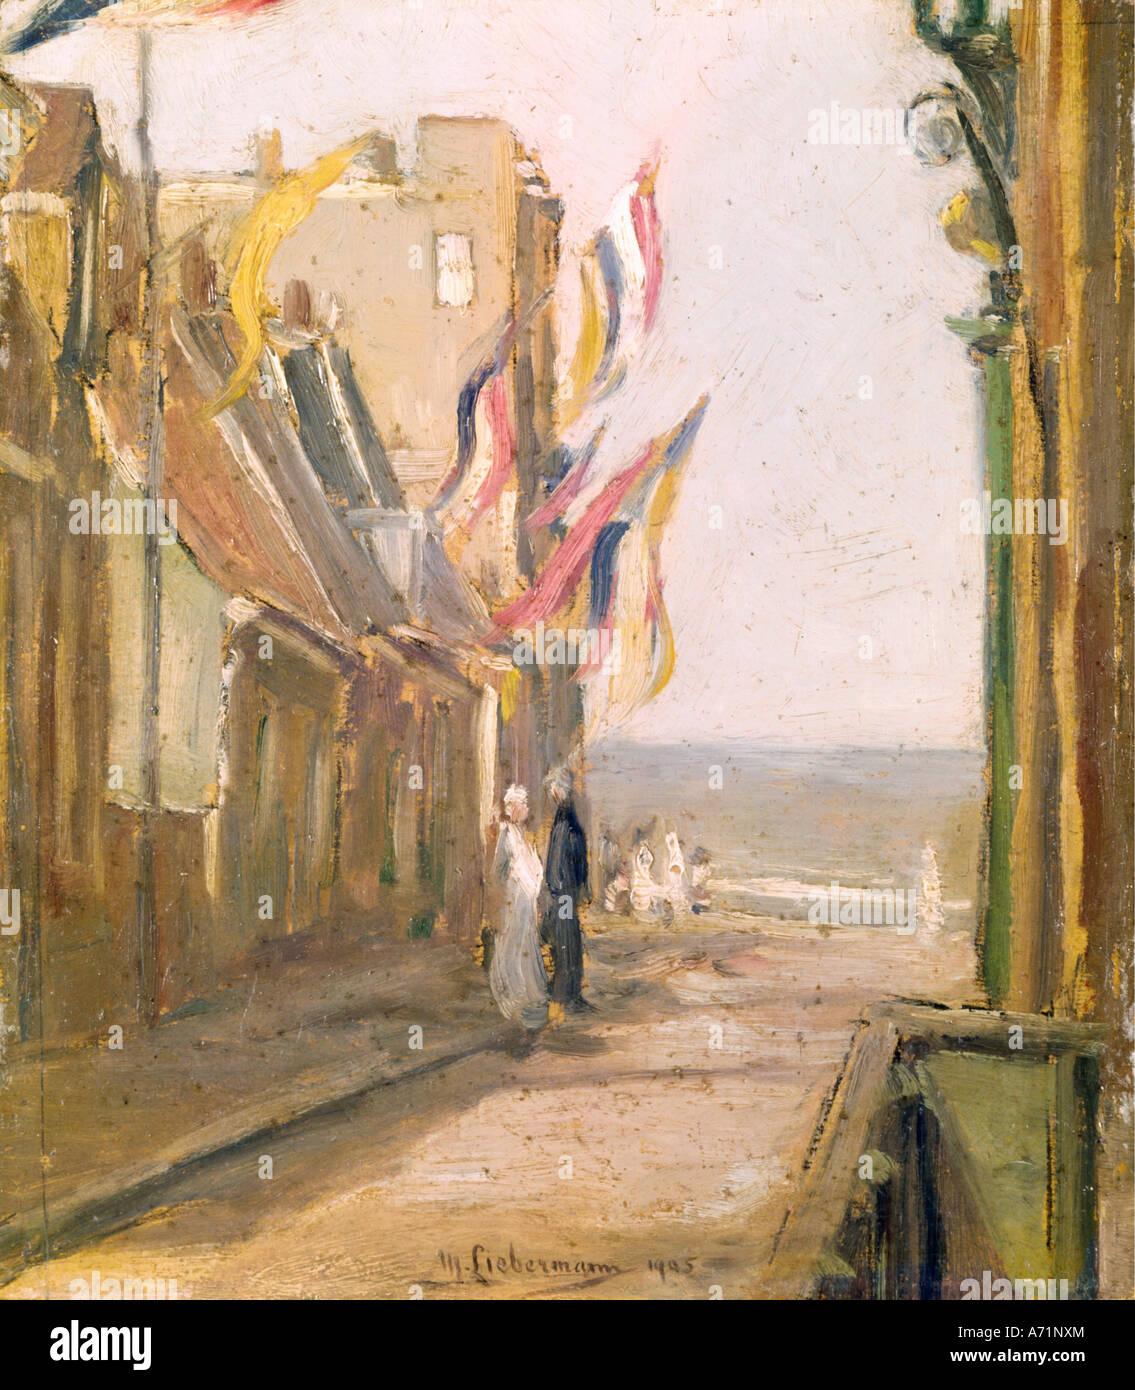 """Fine Arts, Liebermann, Max, (1847-1935), Malerei,""Feiertag"", (""Urlaub""), Privateigentum, Stockbild"